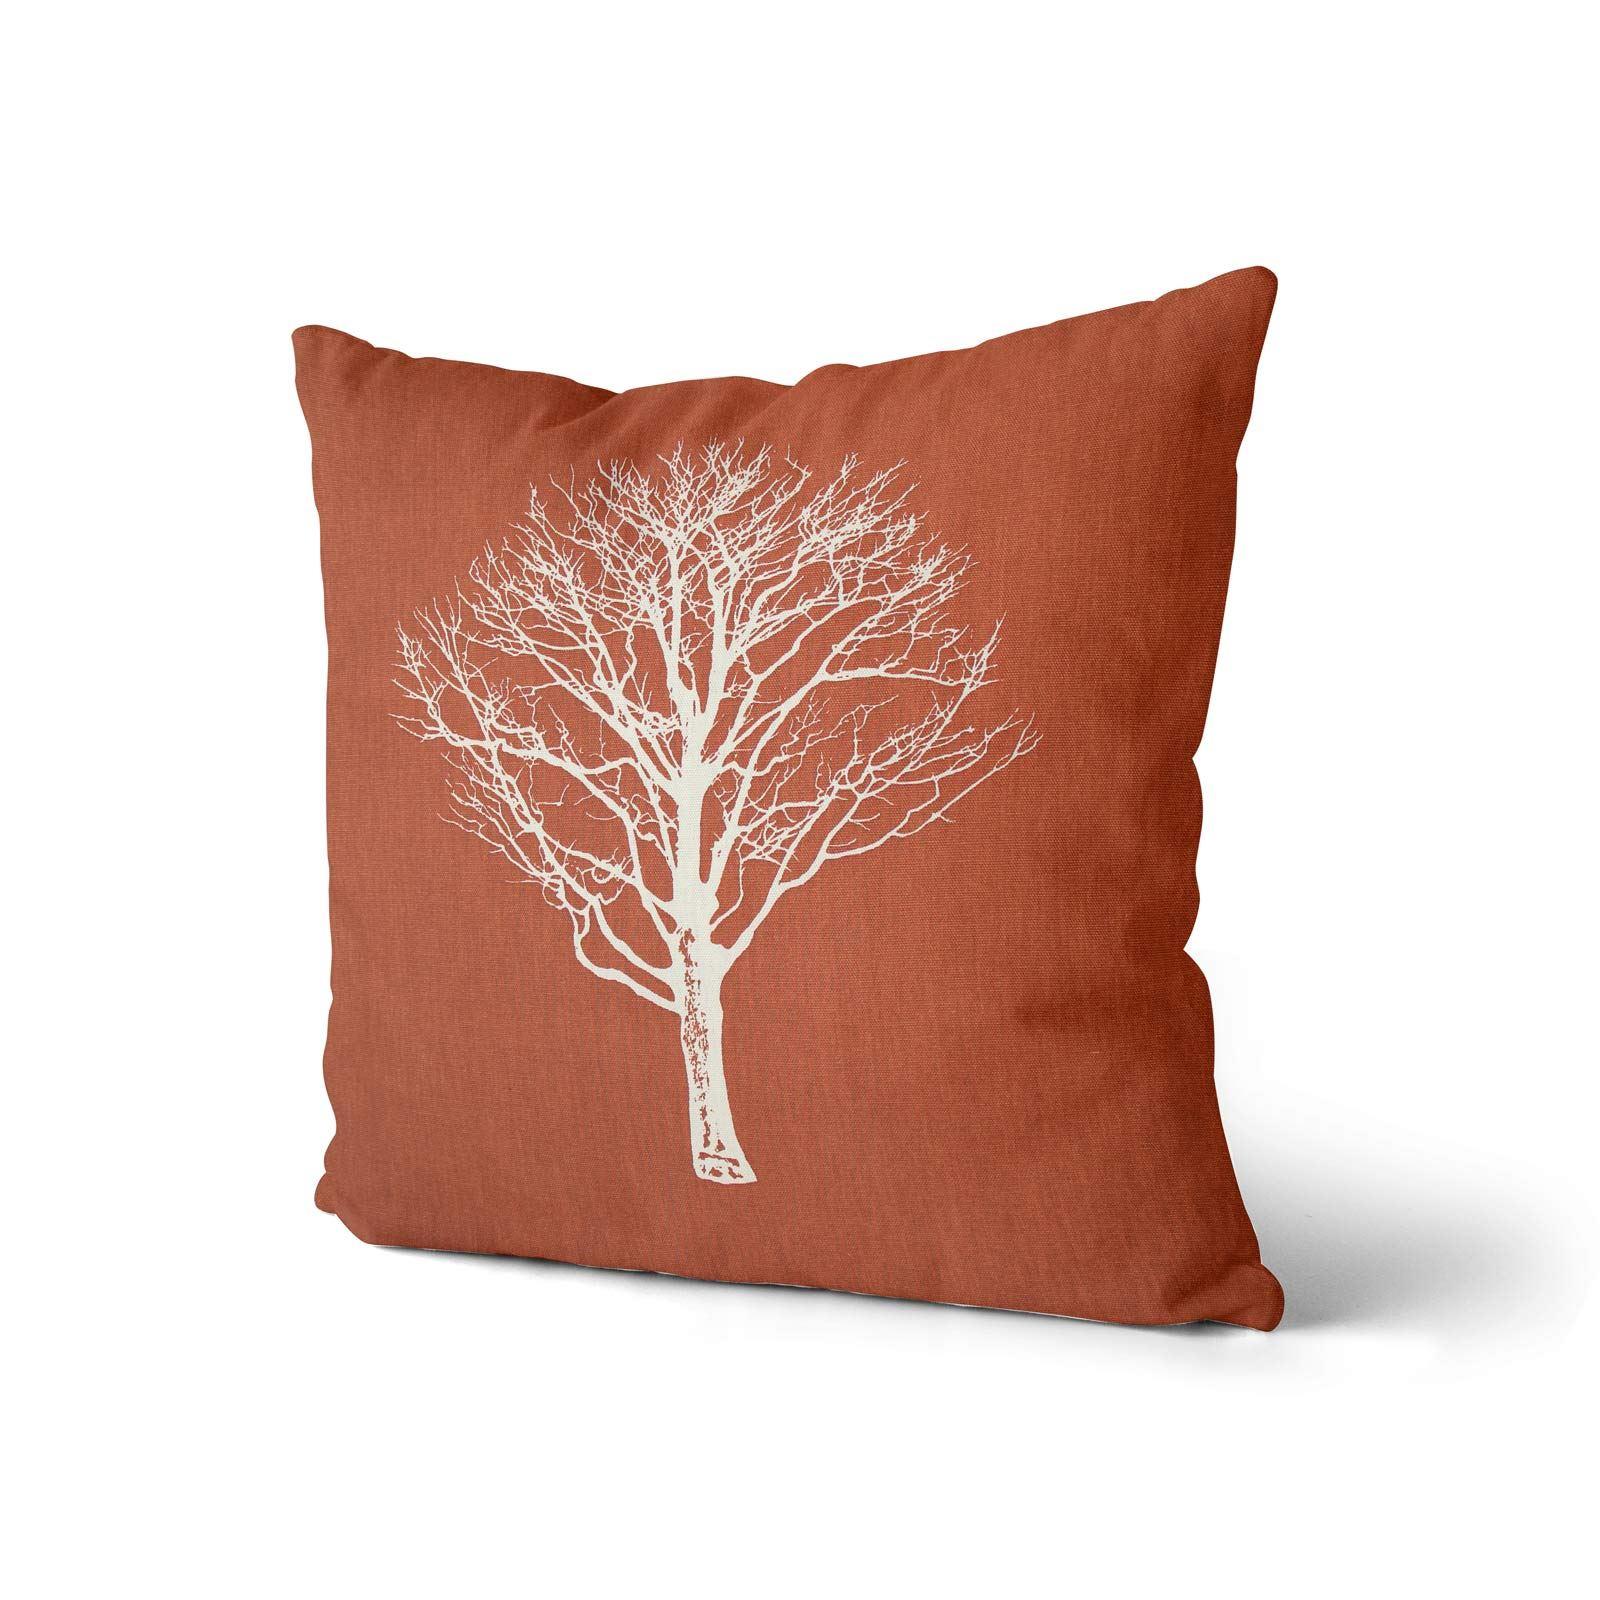 Woodland-Trees-Cushion-Cover-Modern-Reversible-Tree-Print-Covers-17-034-x-17-034 thumbnail 13